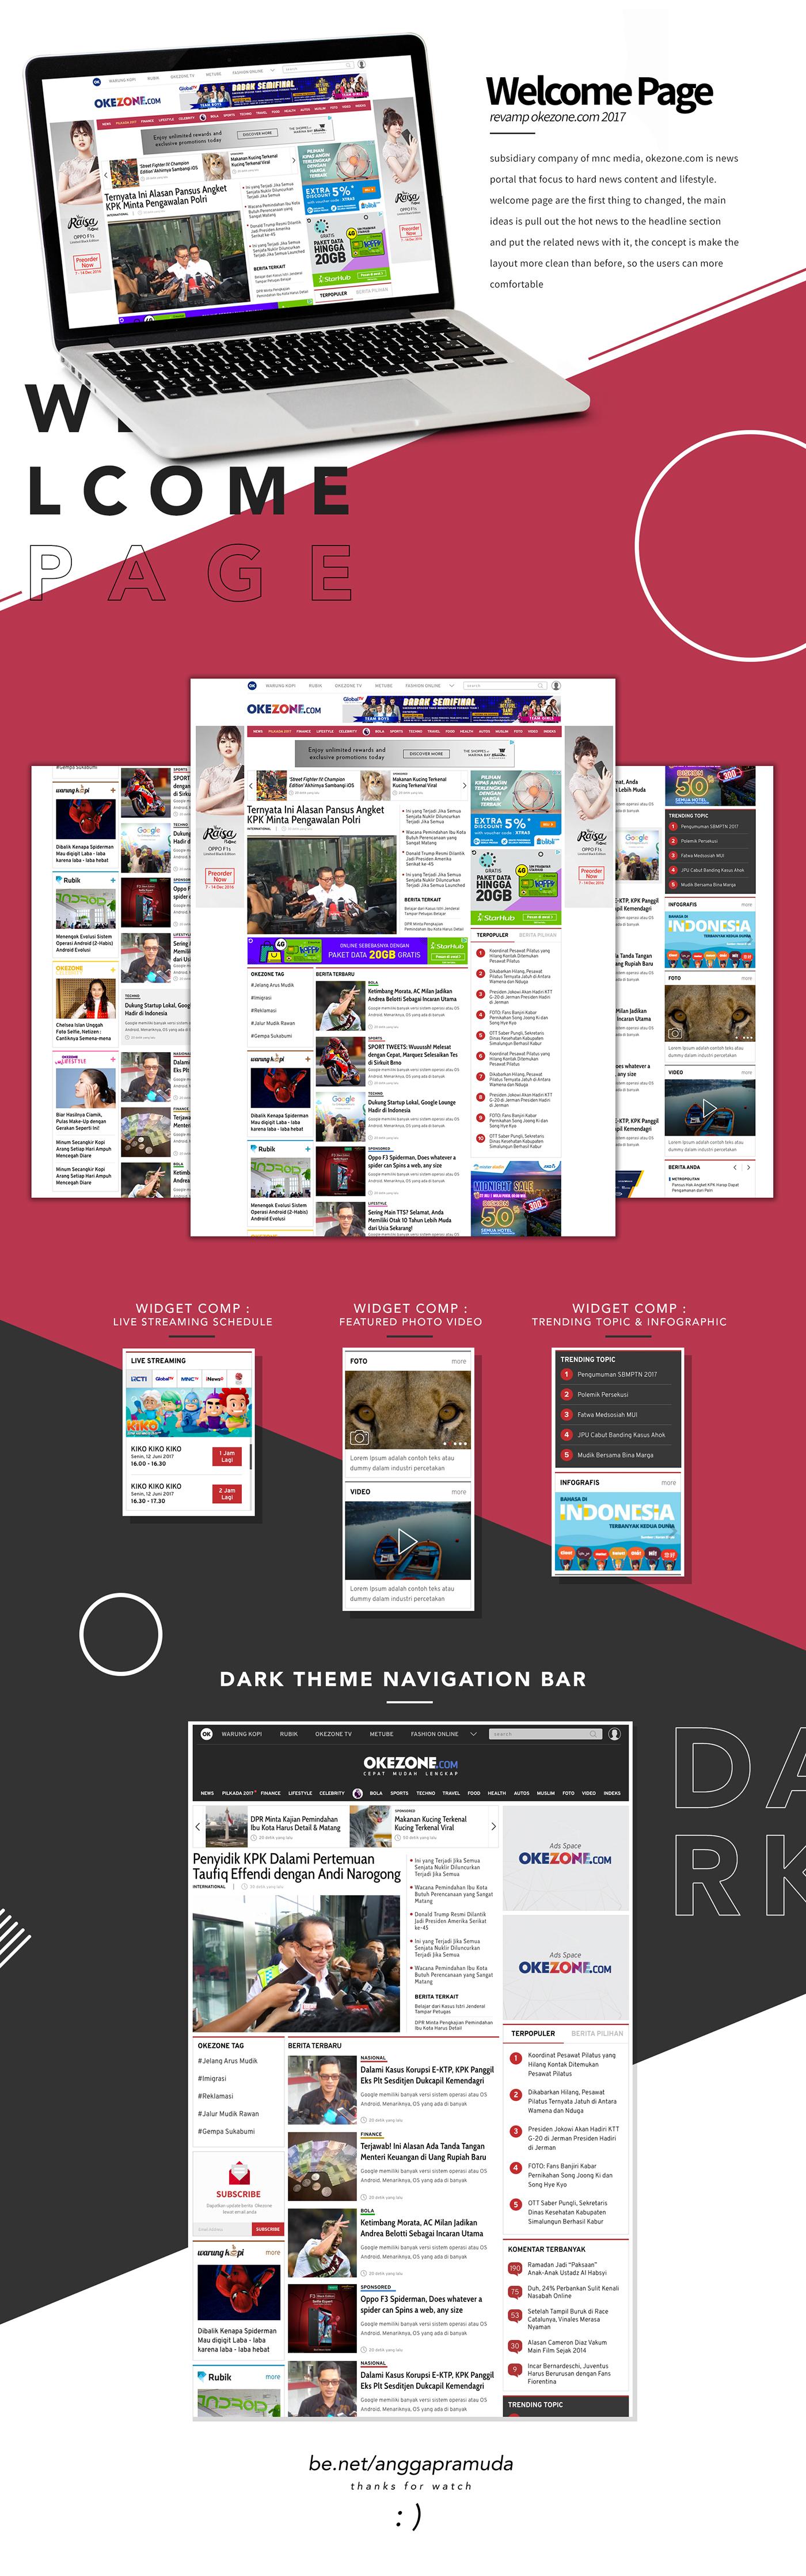 okezone.com,okezone,Welcome Page,revamp,MNC,MNC MEDIA